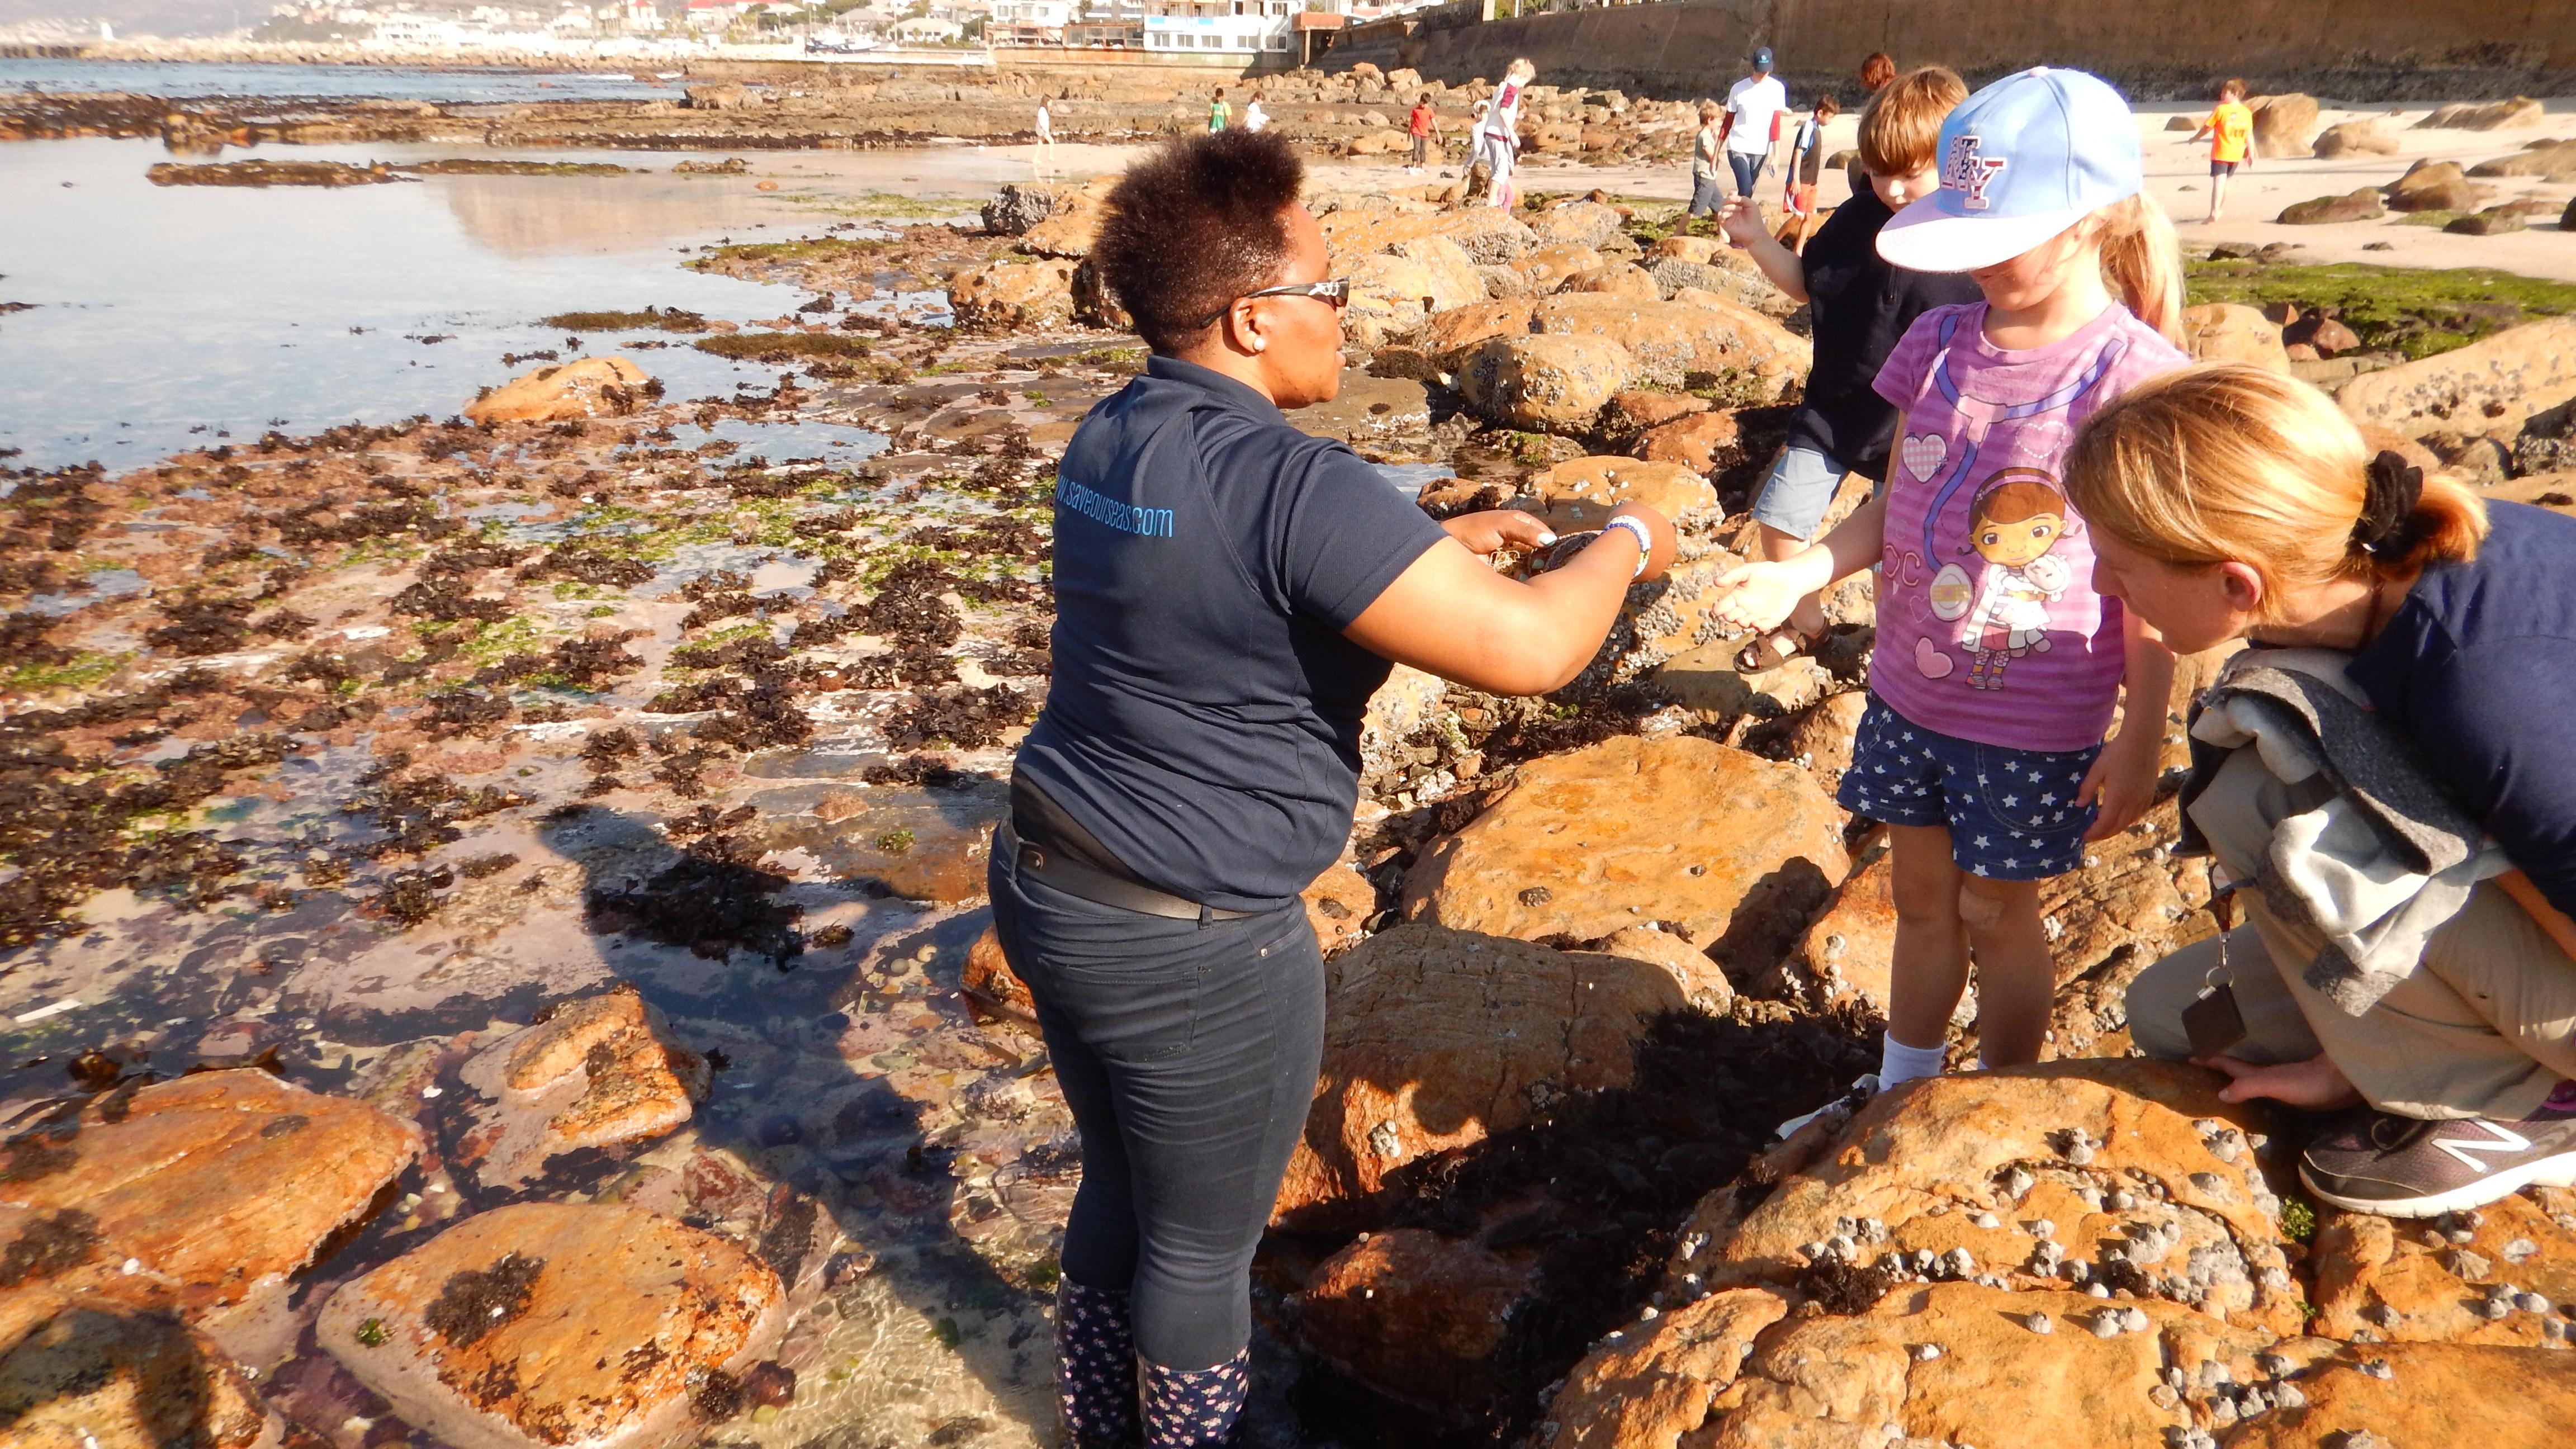 Assistant Educator Zanele Mayiya shows off some interesting seashore finds